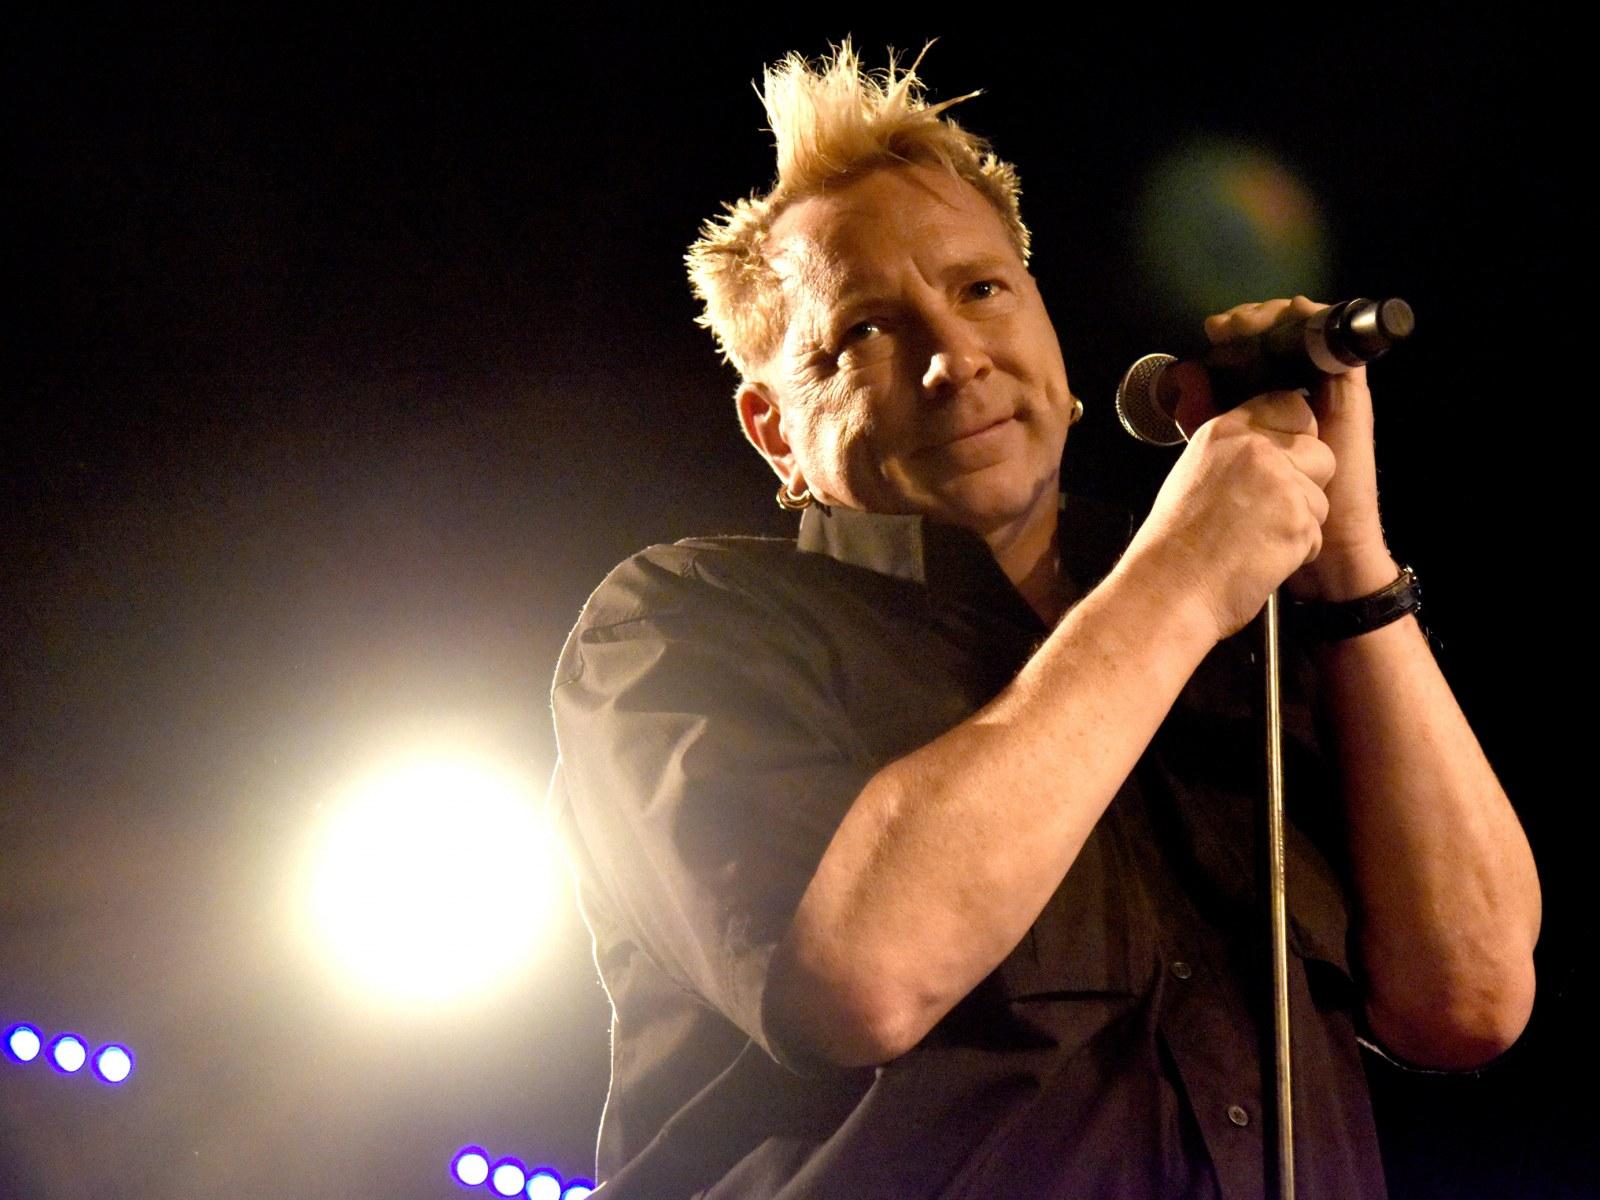 John Lydon's Trump Support Leaves Sex Pistols Fans Feeling Rotten